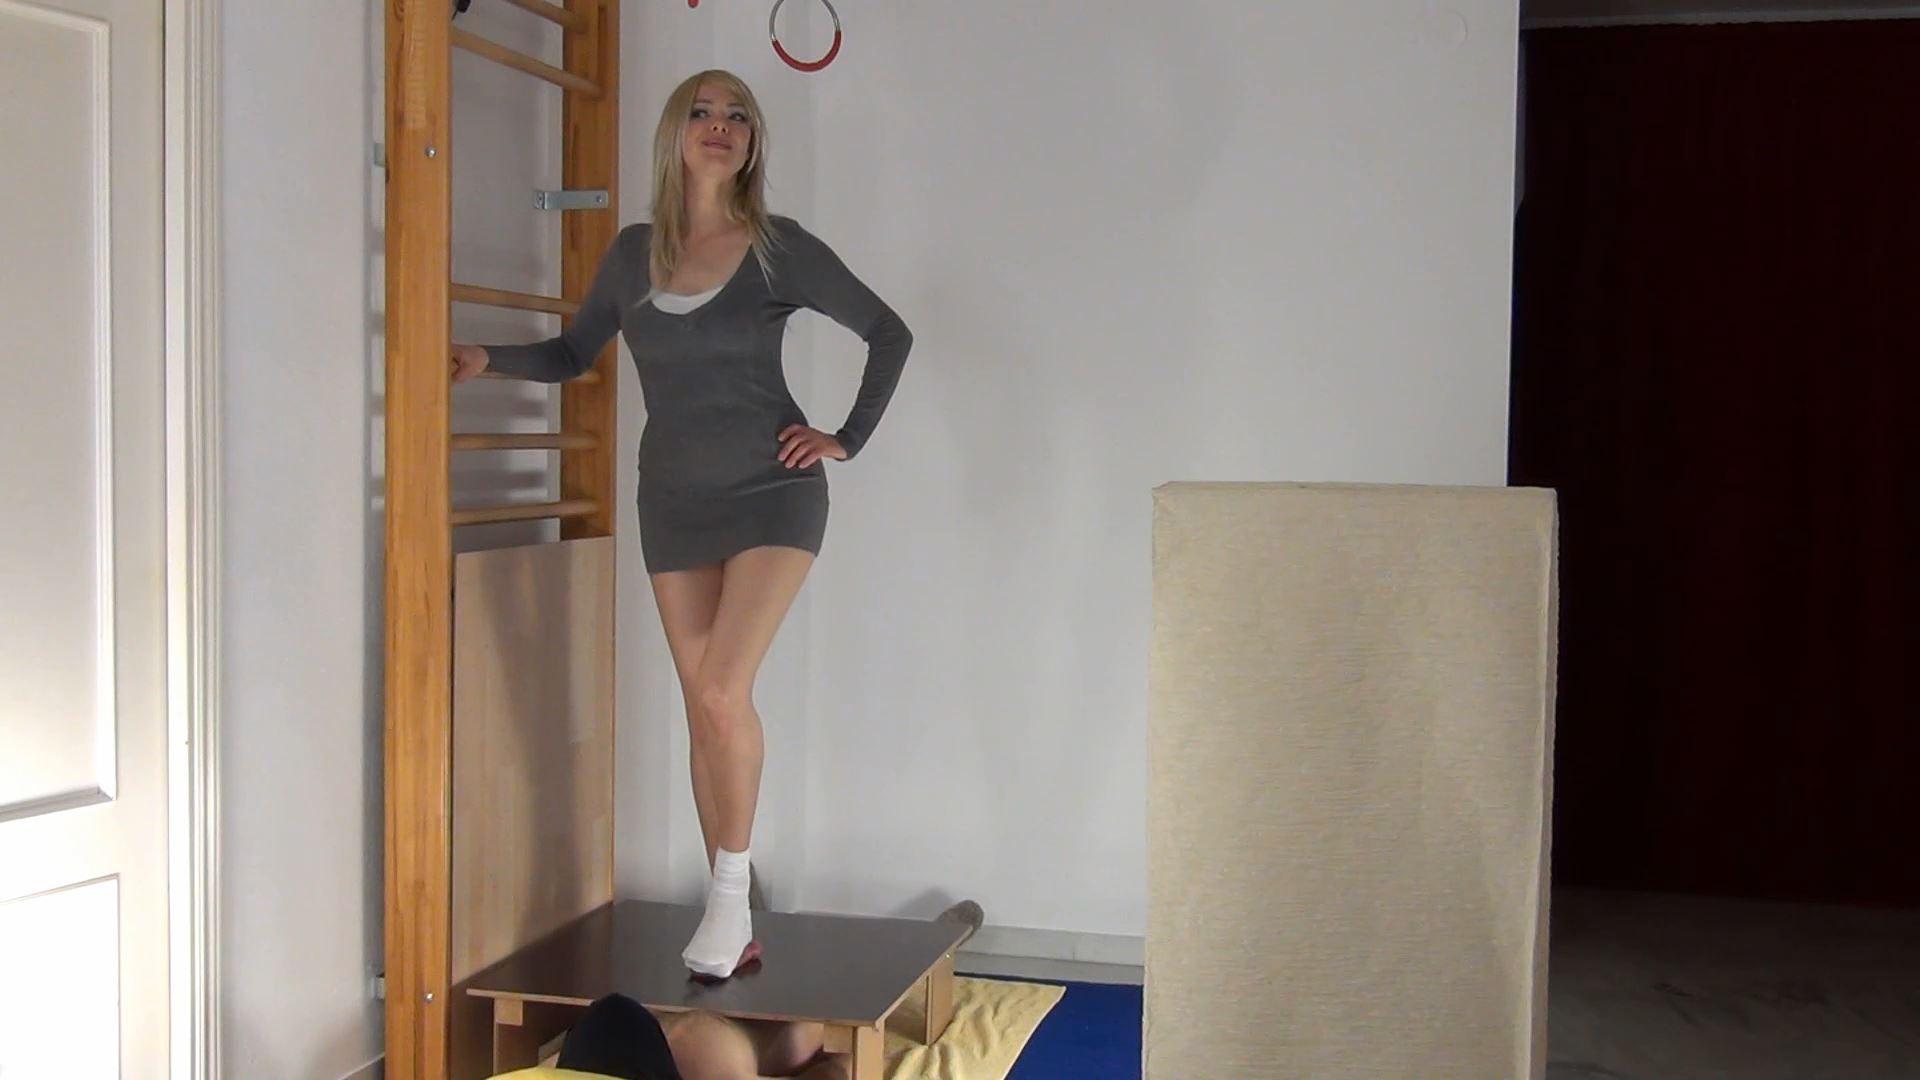 Alina In Scene: Alina Trampled Nuts under White Socks - CBTRAMPLE - FULL HD/1080p/MP4